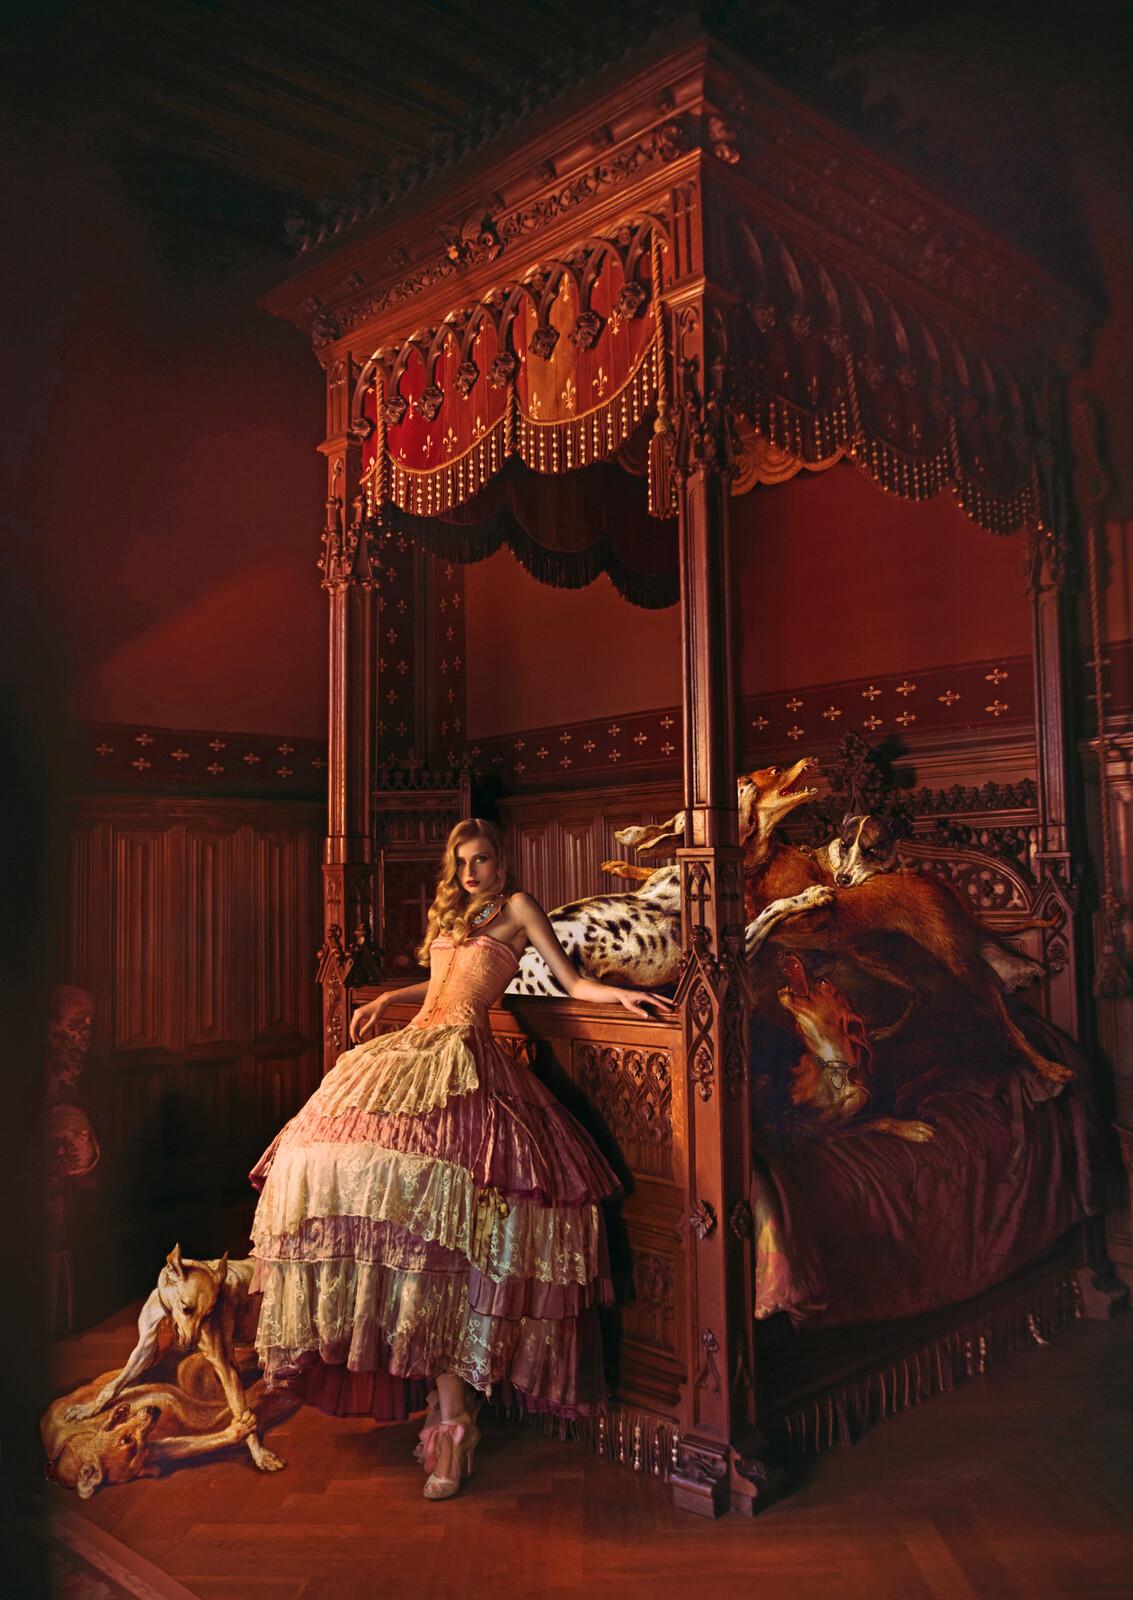 Bedtime Brawl - Miss Aniela